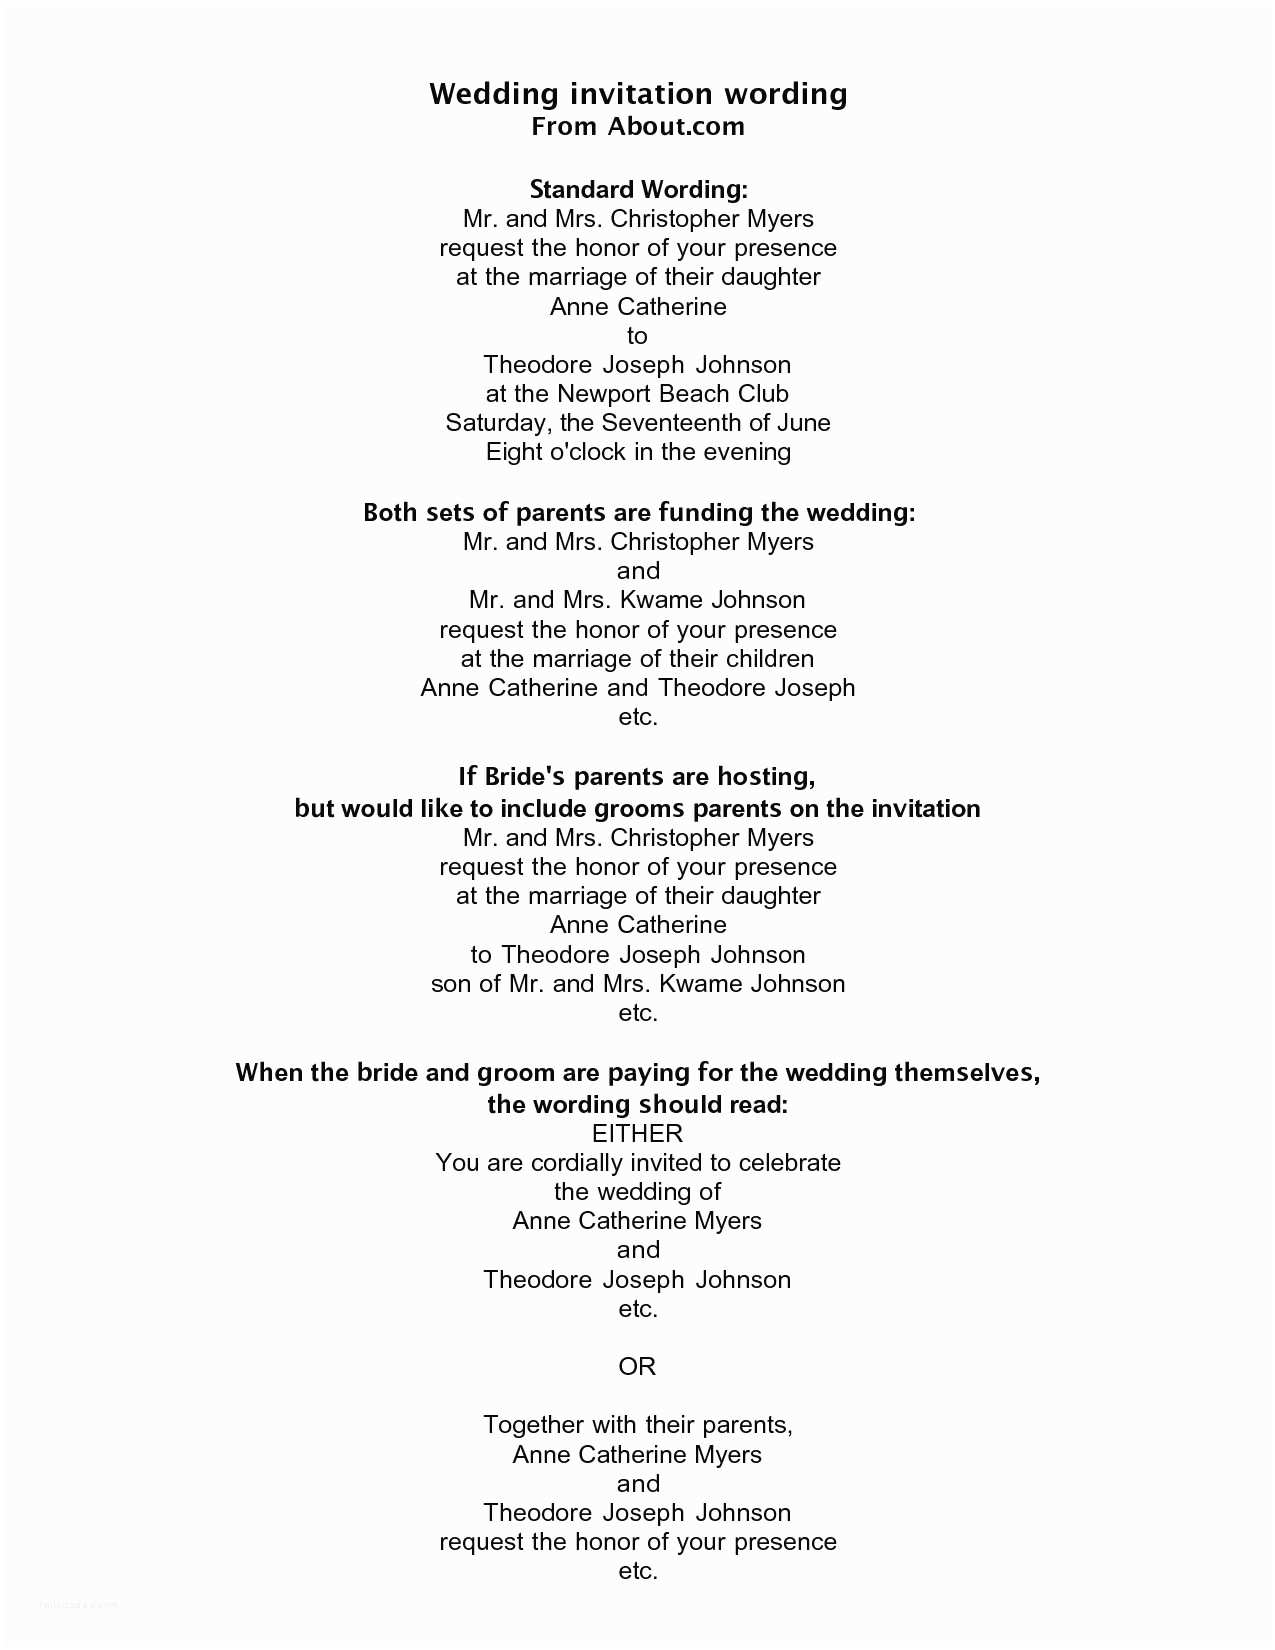 Romantic Wedding Invitations Wording Examples Romantic Wedding Invitation Wording From Bride and Groom